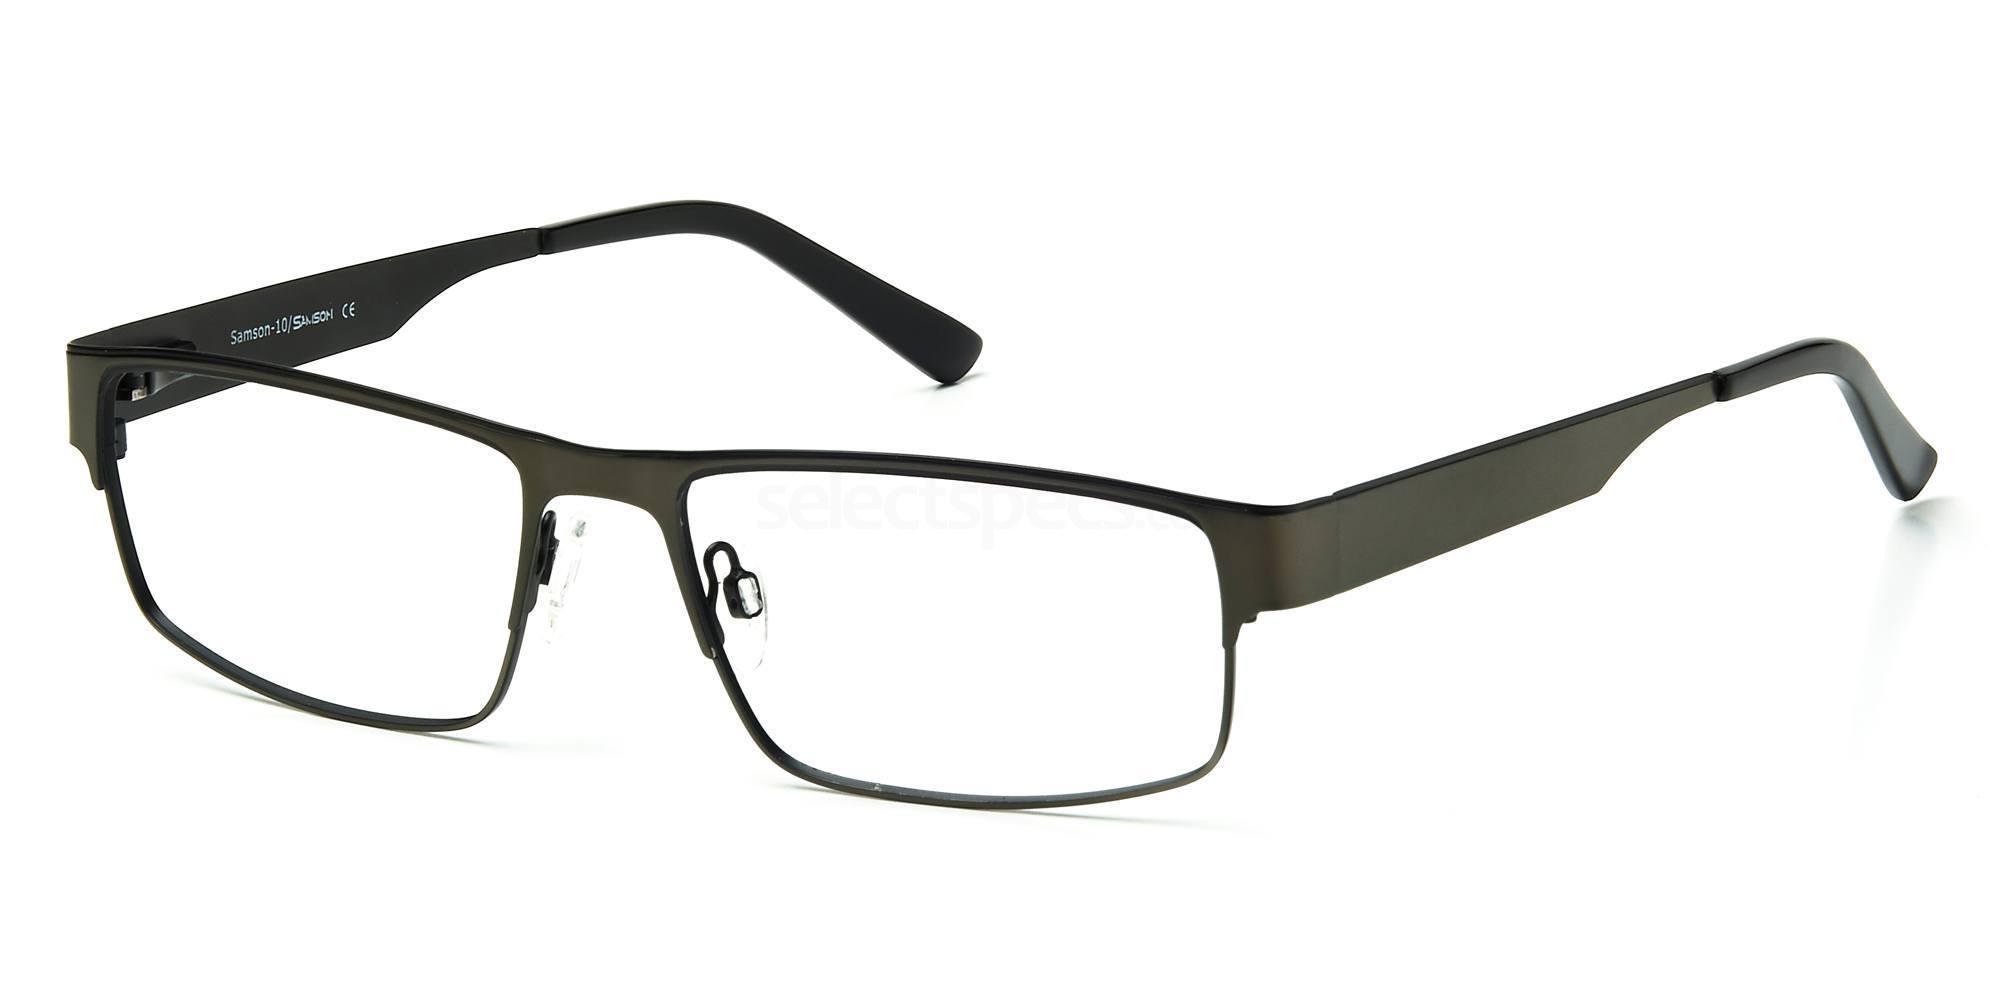 C1 SAMSON10 Glasses, Samson